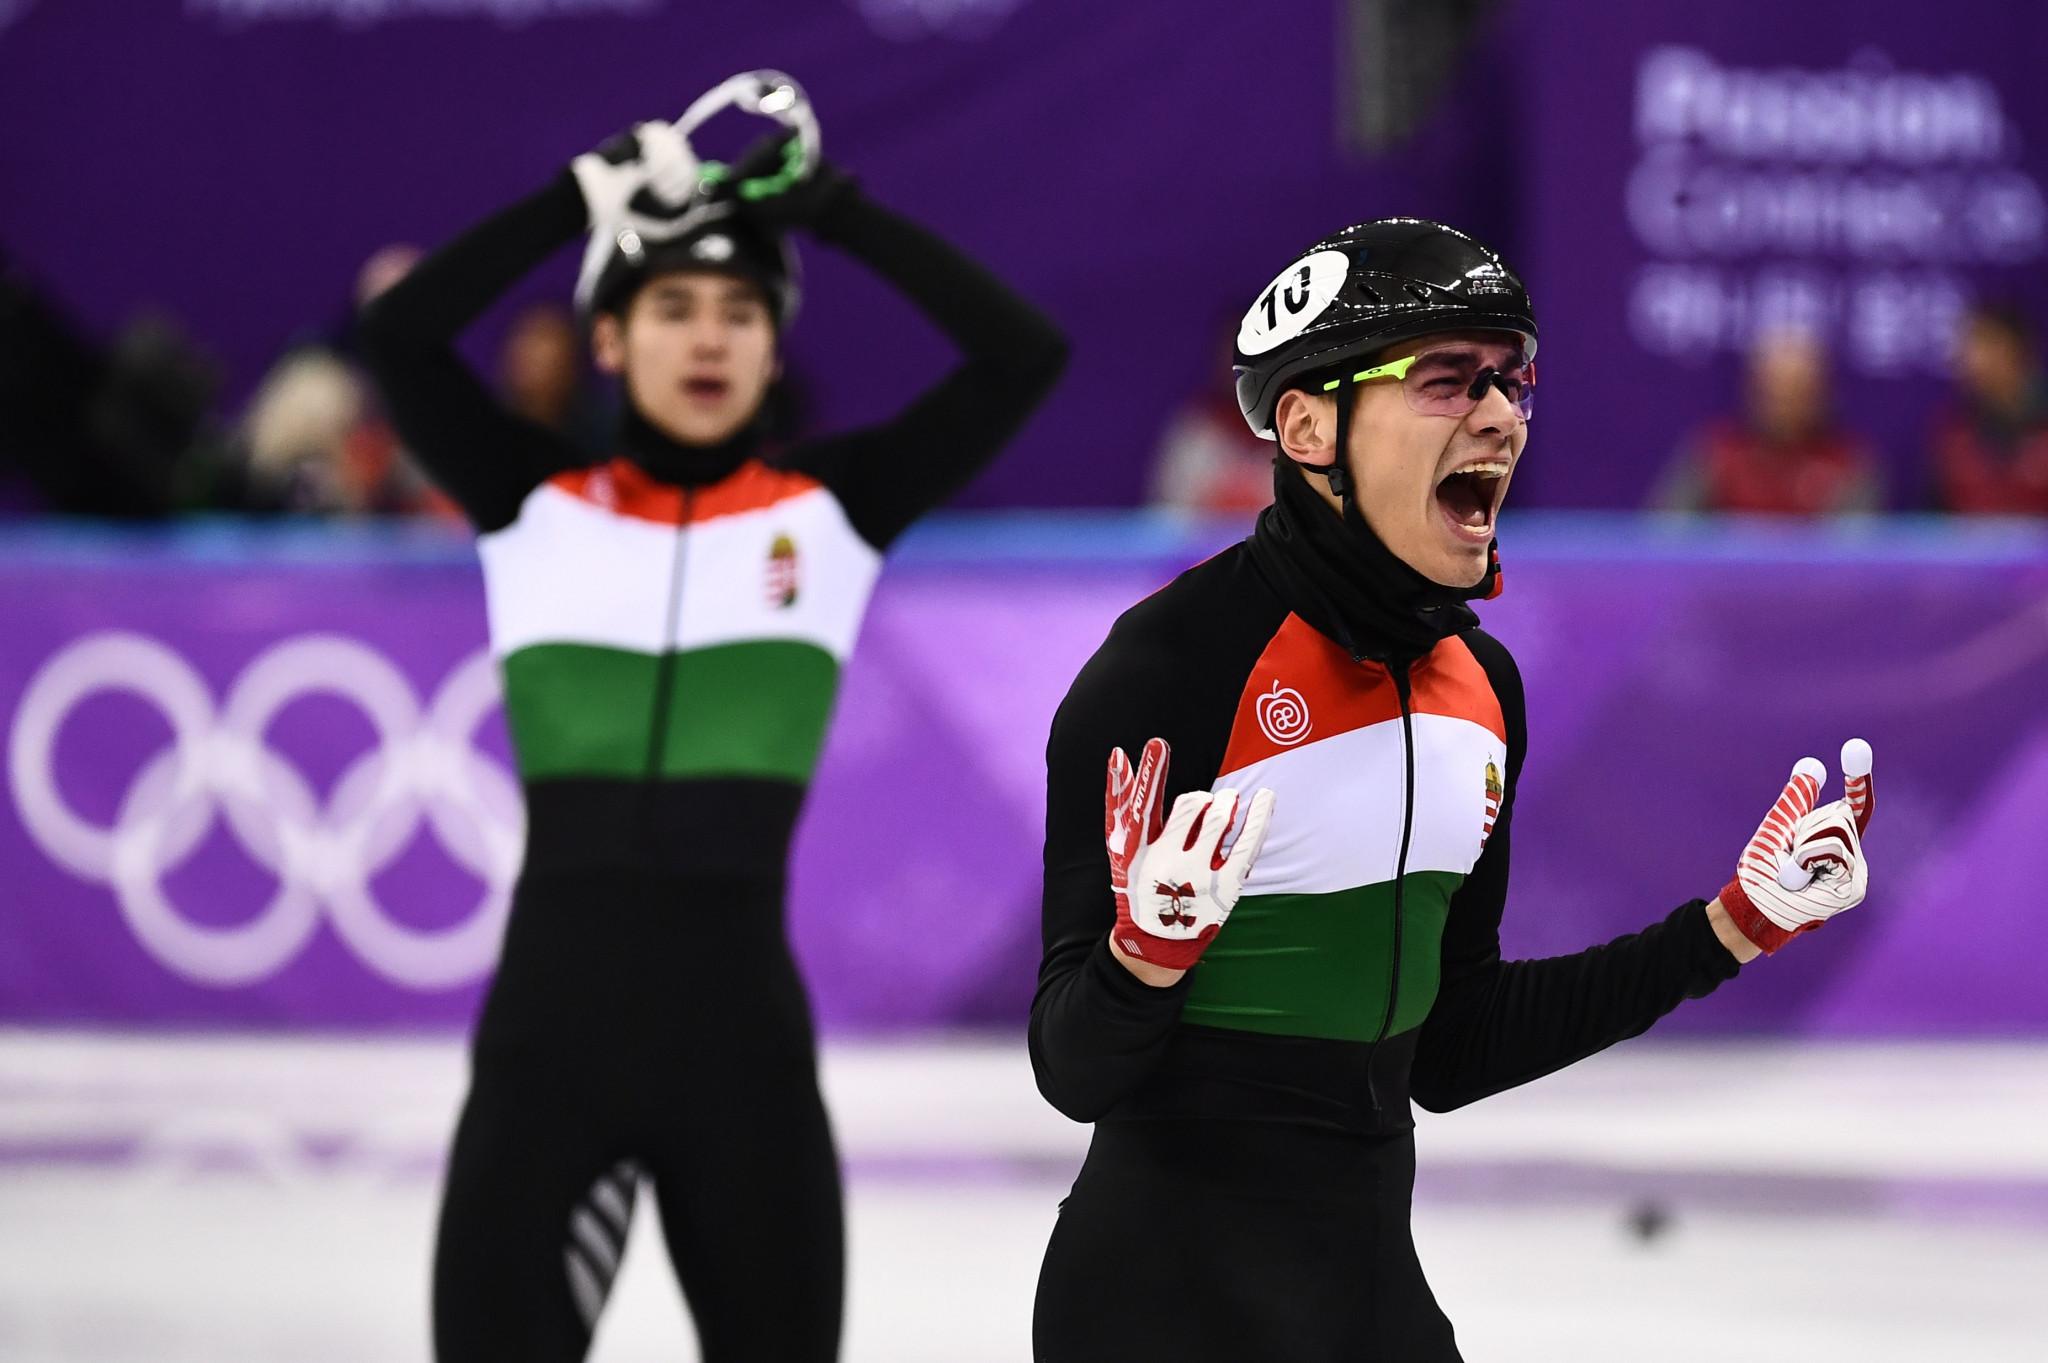 Shaolin Sandor and Shaoang Liu celebrate winning the 5,000m relay at Pyeongchang 2018 Winter Olympics © Getty Images